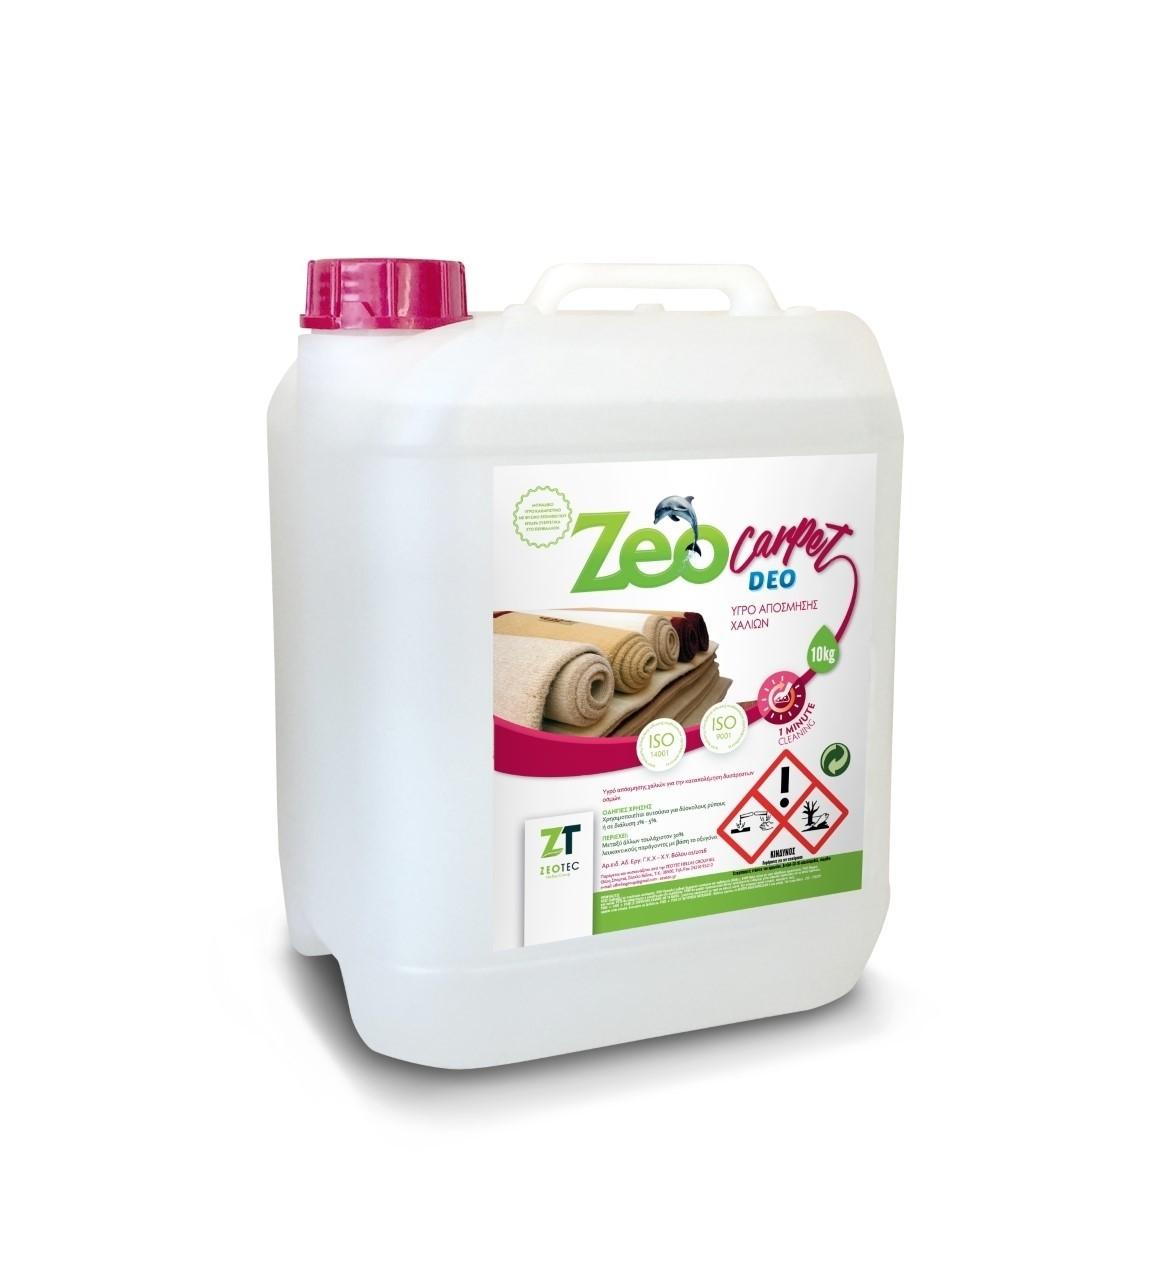 Zeo Carpet Deo - Εξειδικευμένο υγρό απόσμησης χαλιών και μοκετών 20lt